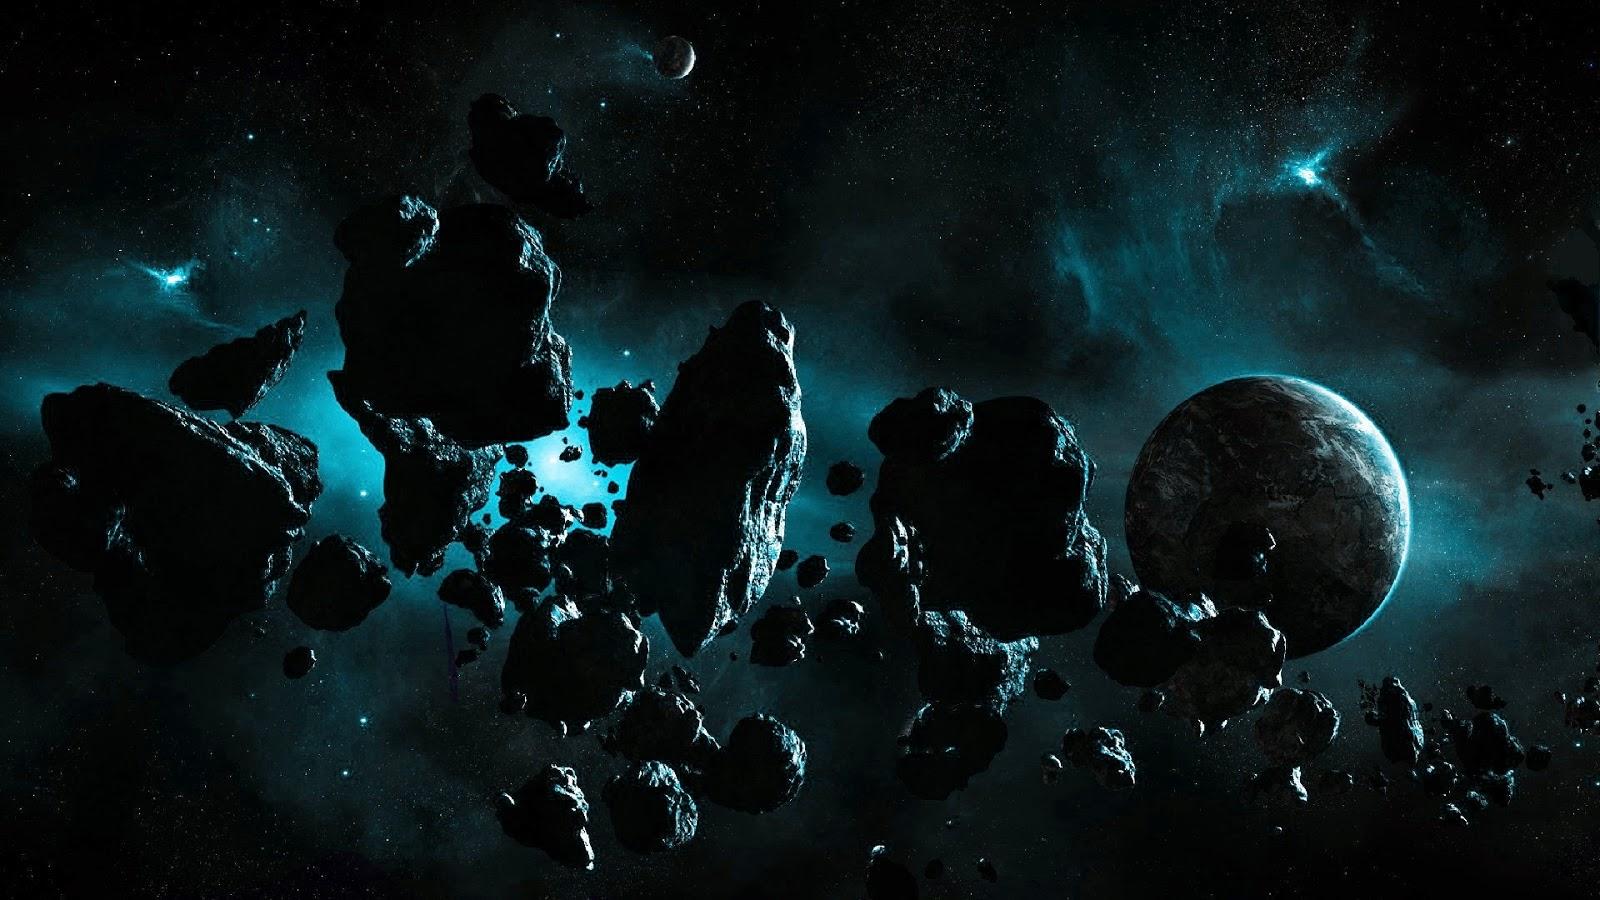 Fondo de Pantalla Abstracto Espacio oscuro - imagenes abstractas ...